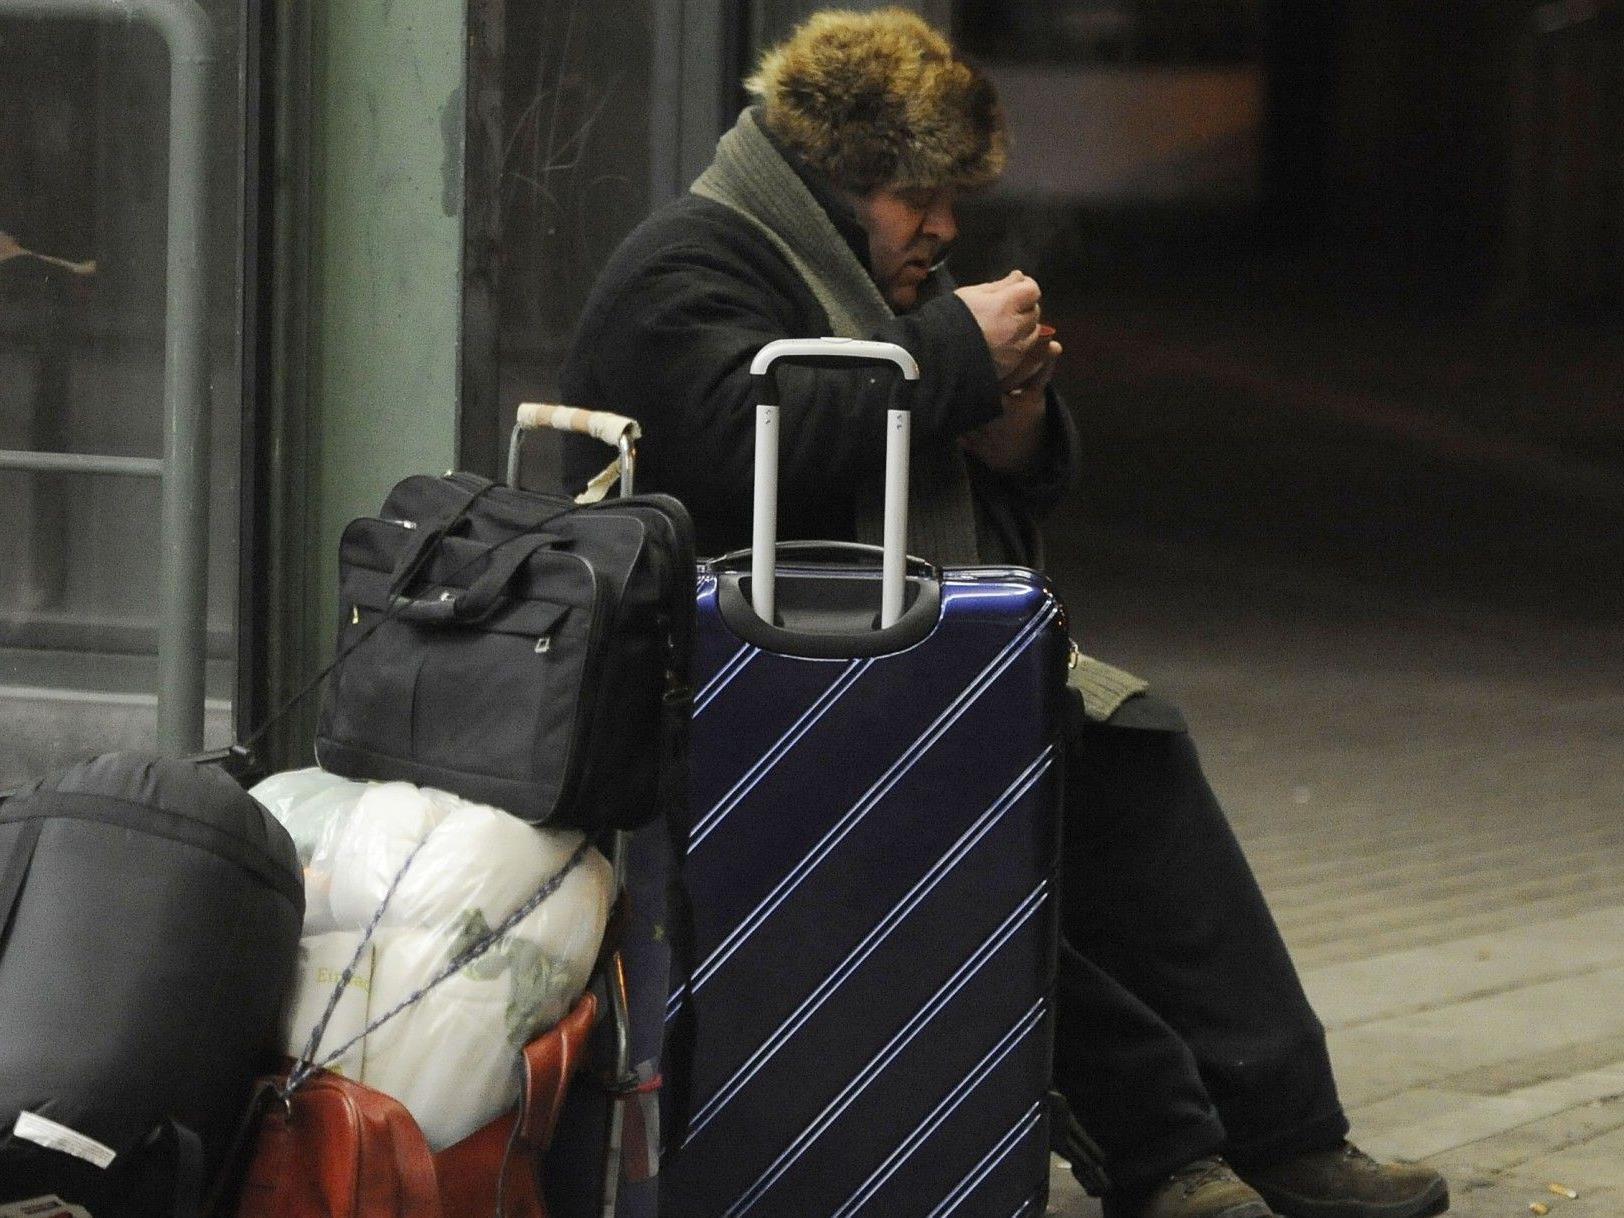 Kältetelefon der Caritas Wien hilft obdachlosen Menschen